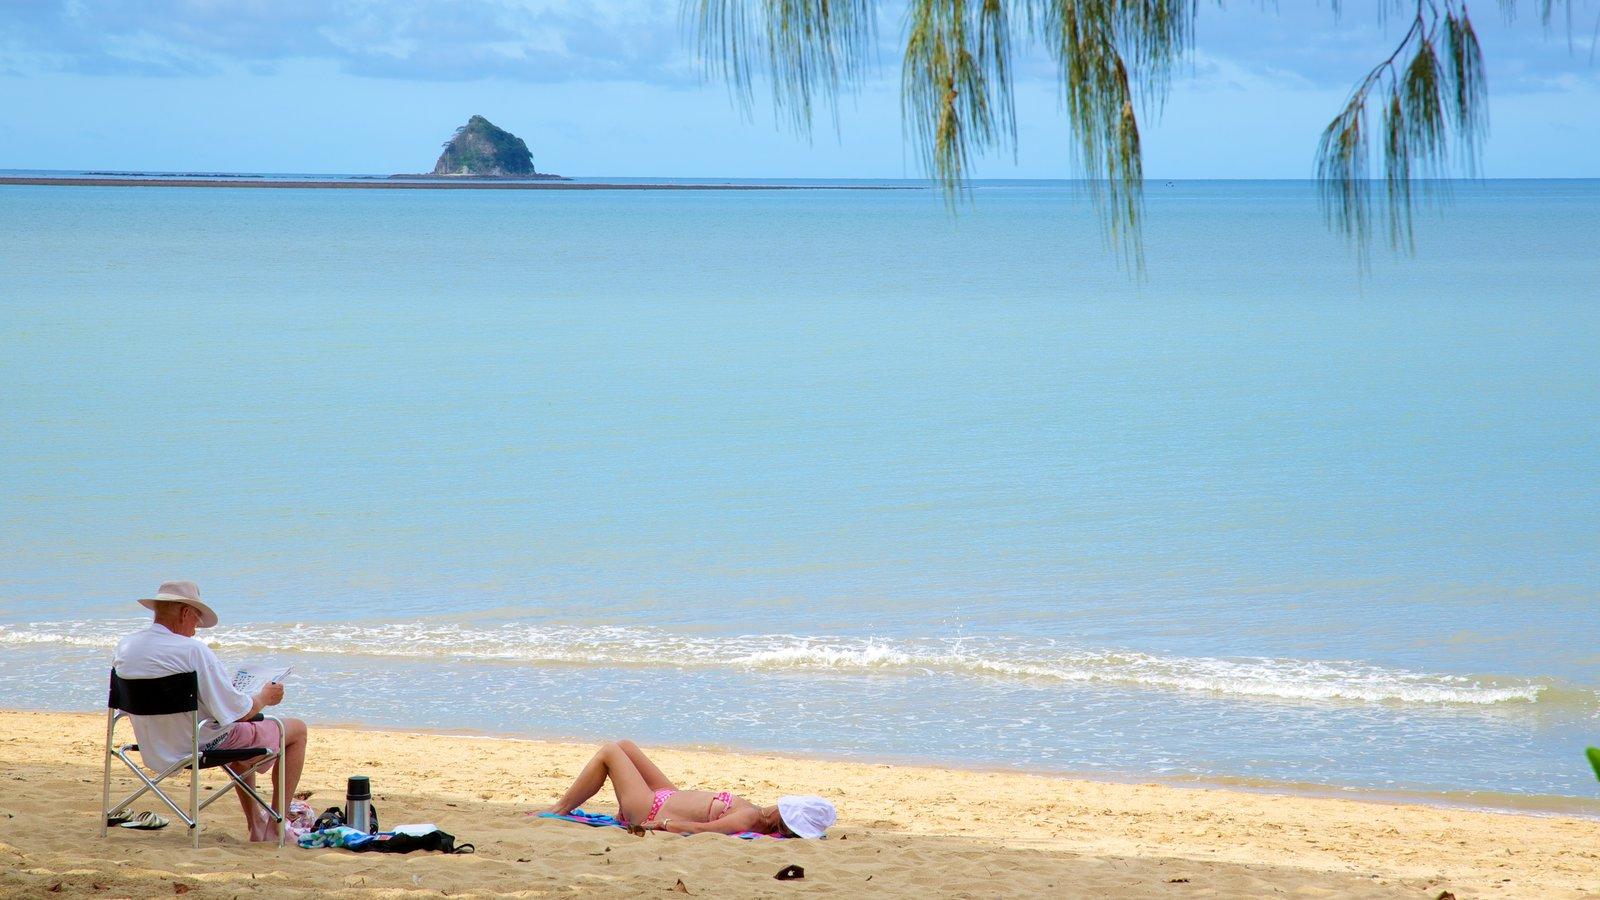 Palm Cove Beach featuring a beach, landscape views and tropical scenes